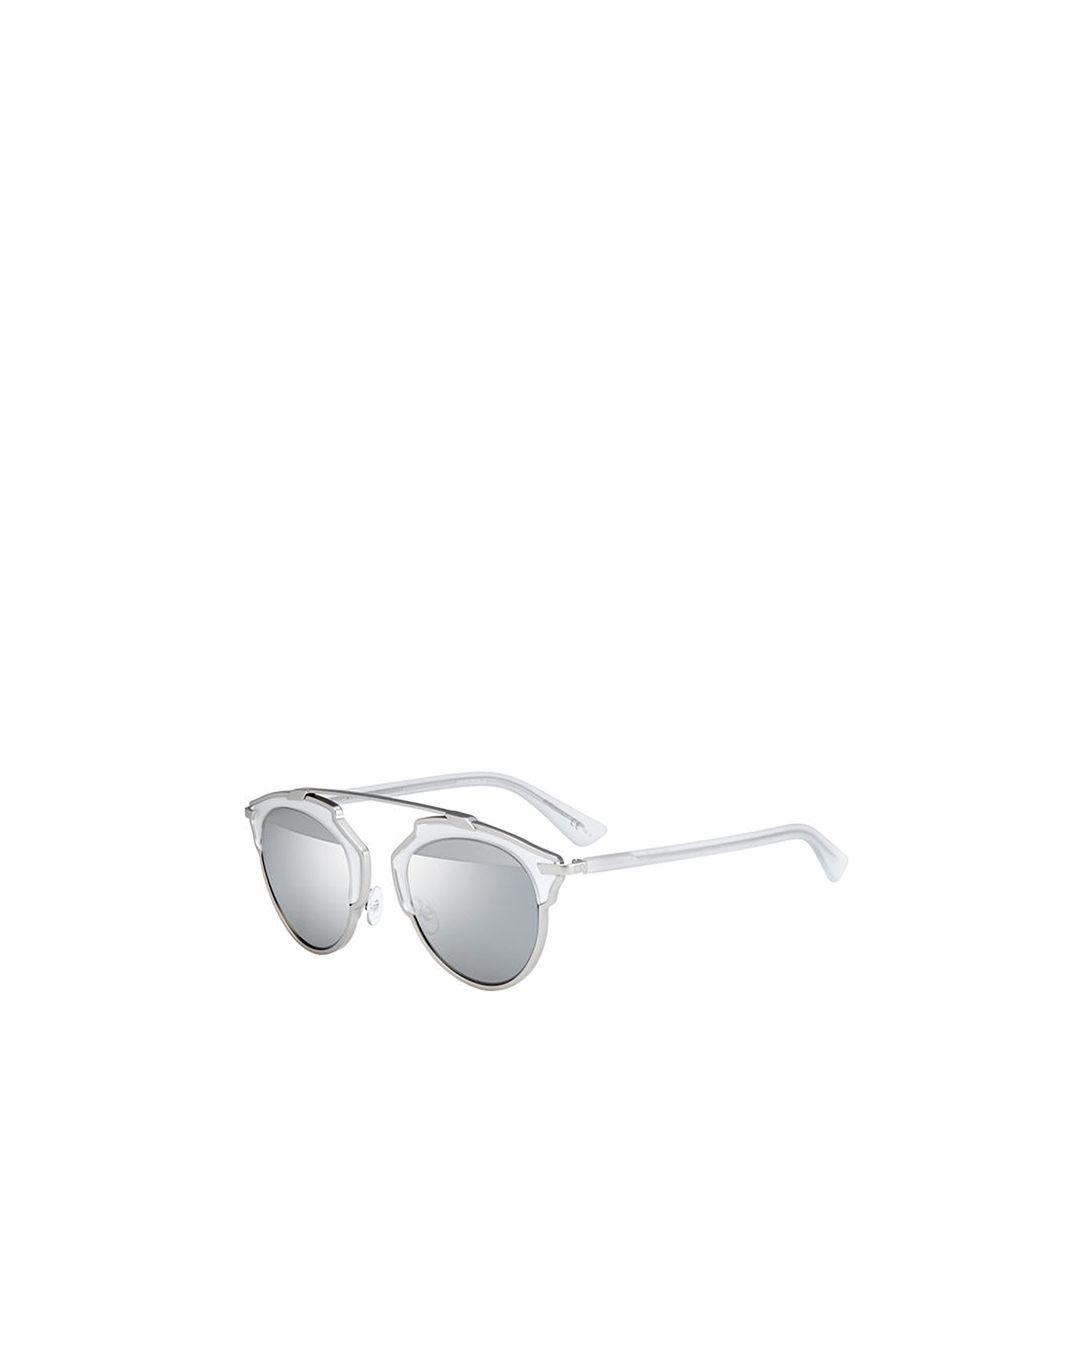 7f3cab936a91 Lyst - Dior 48mm in Metallic